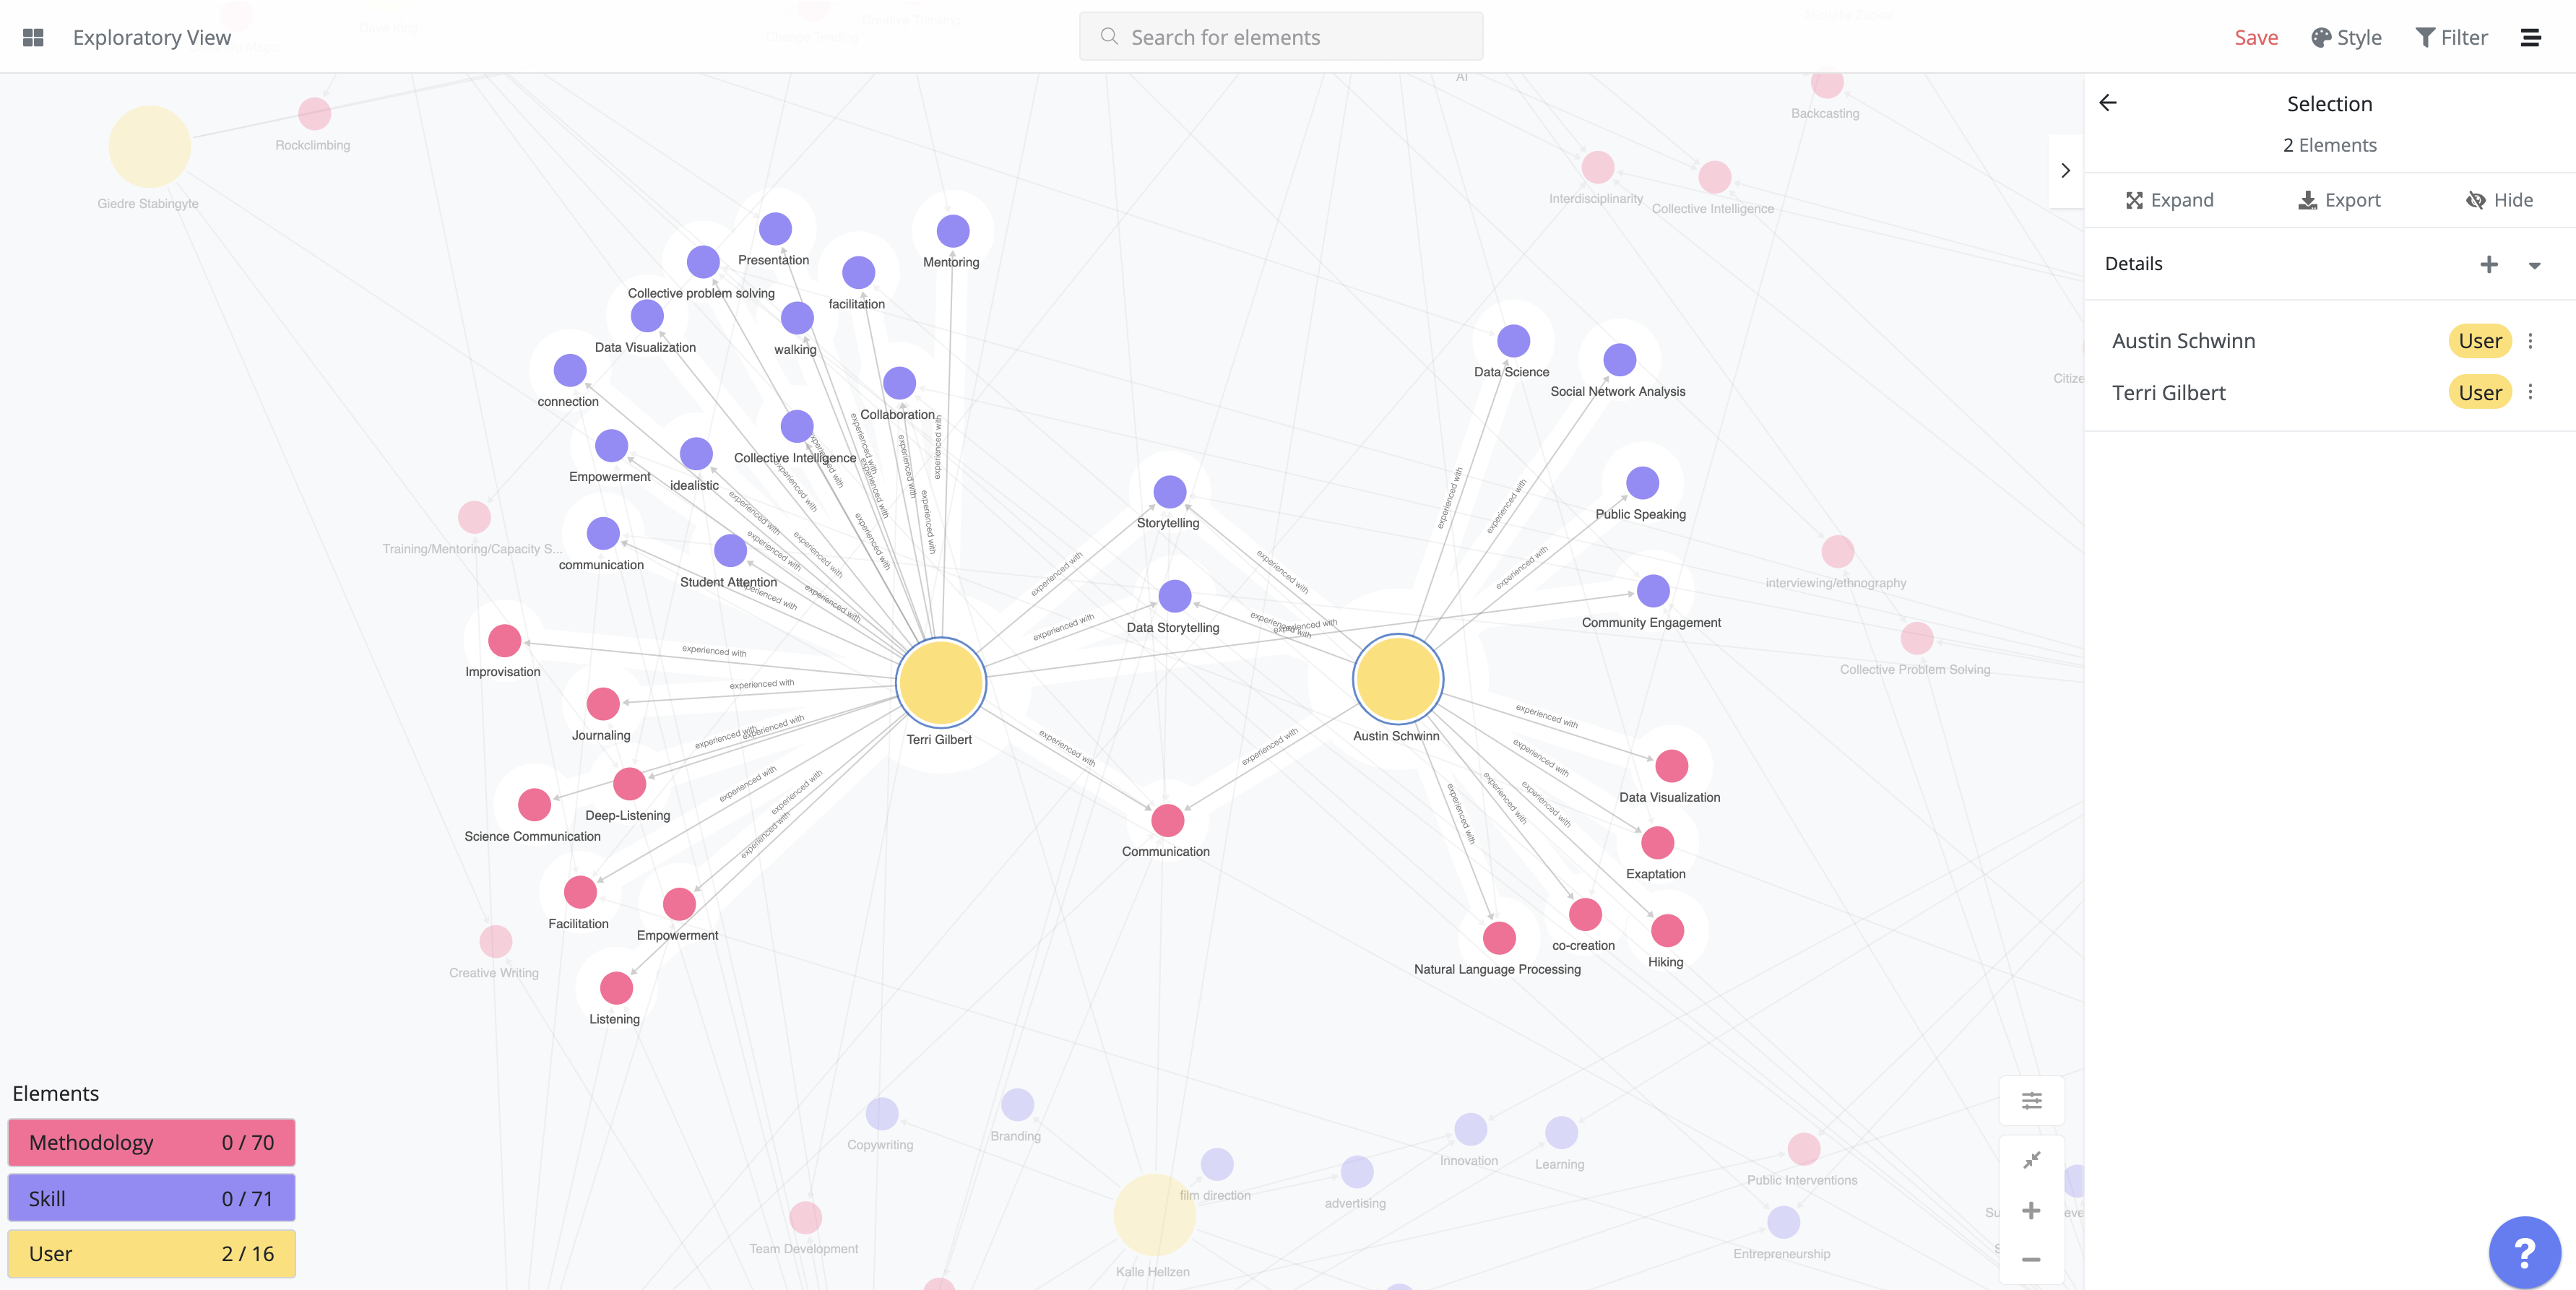 Tools to analyze portfolios